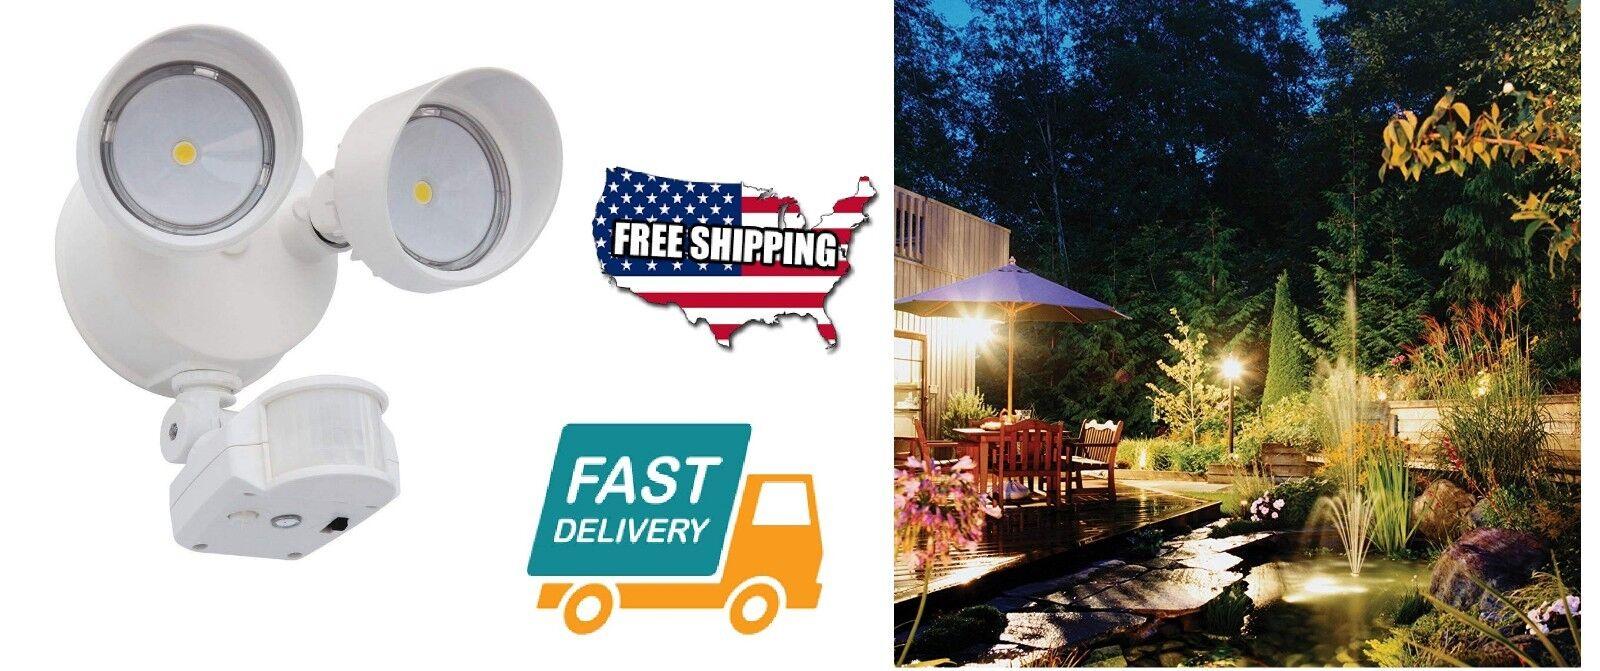 Outdoor Security Flood Light LED 180 Degree Motion-Sensor We